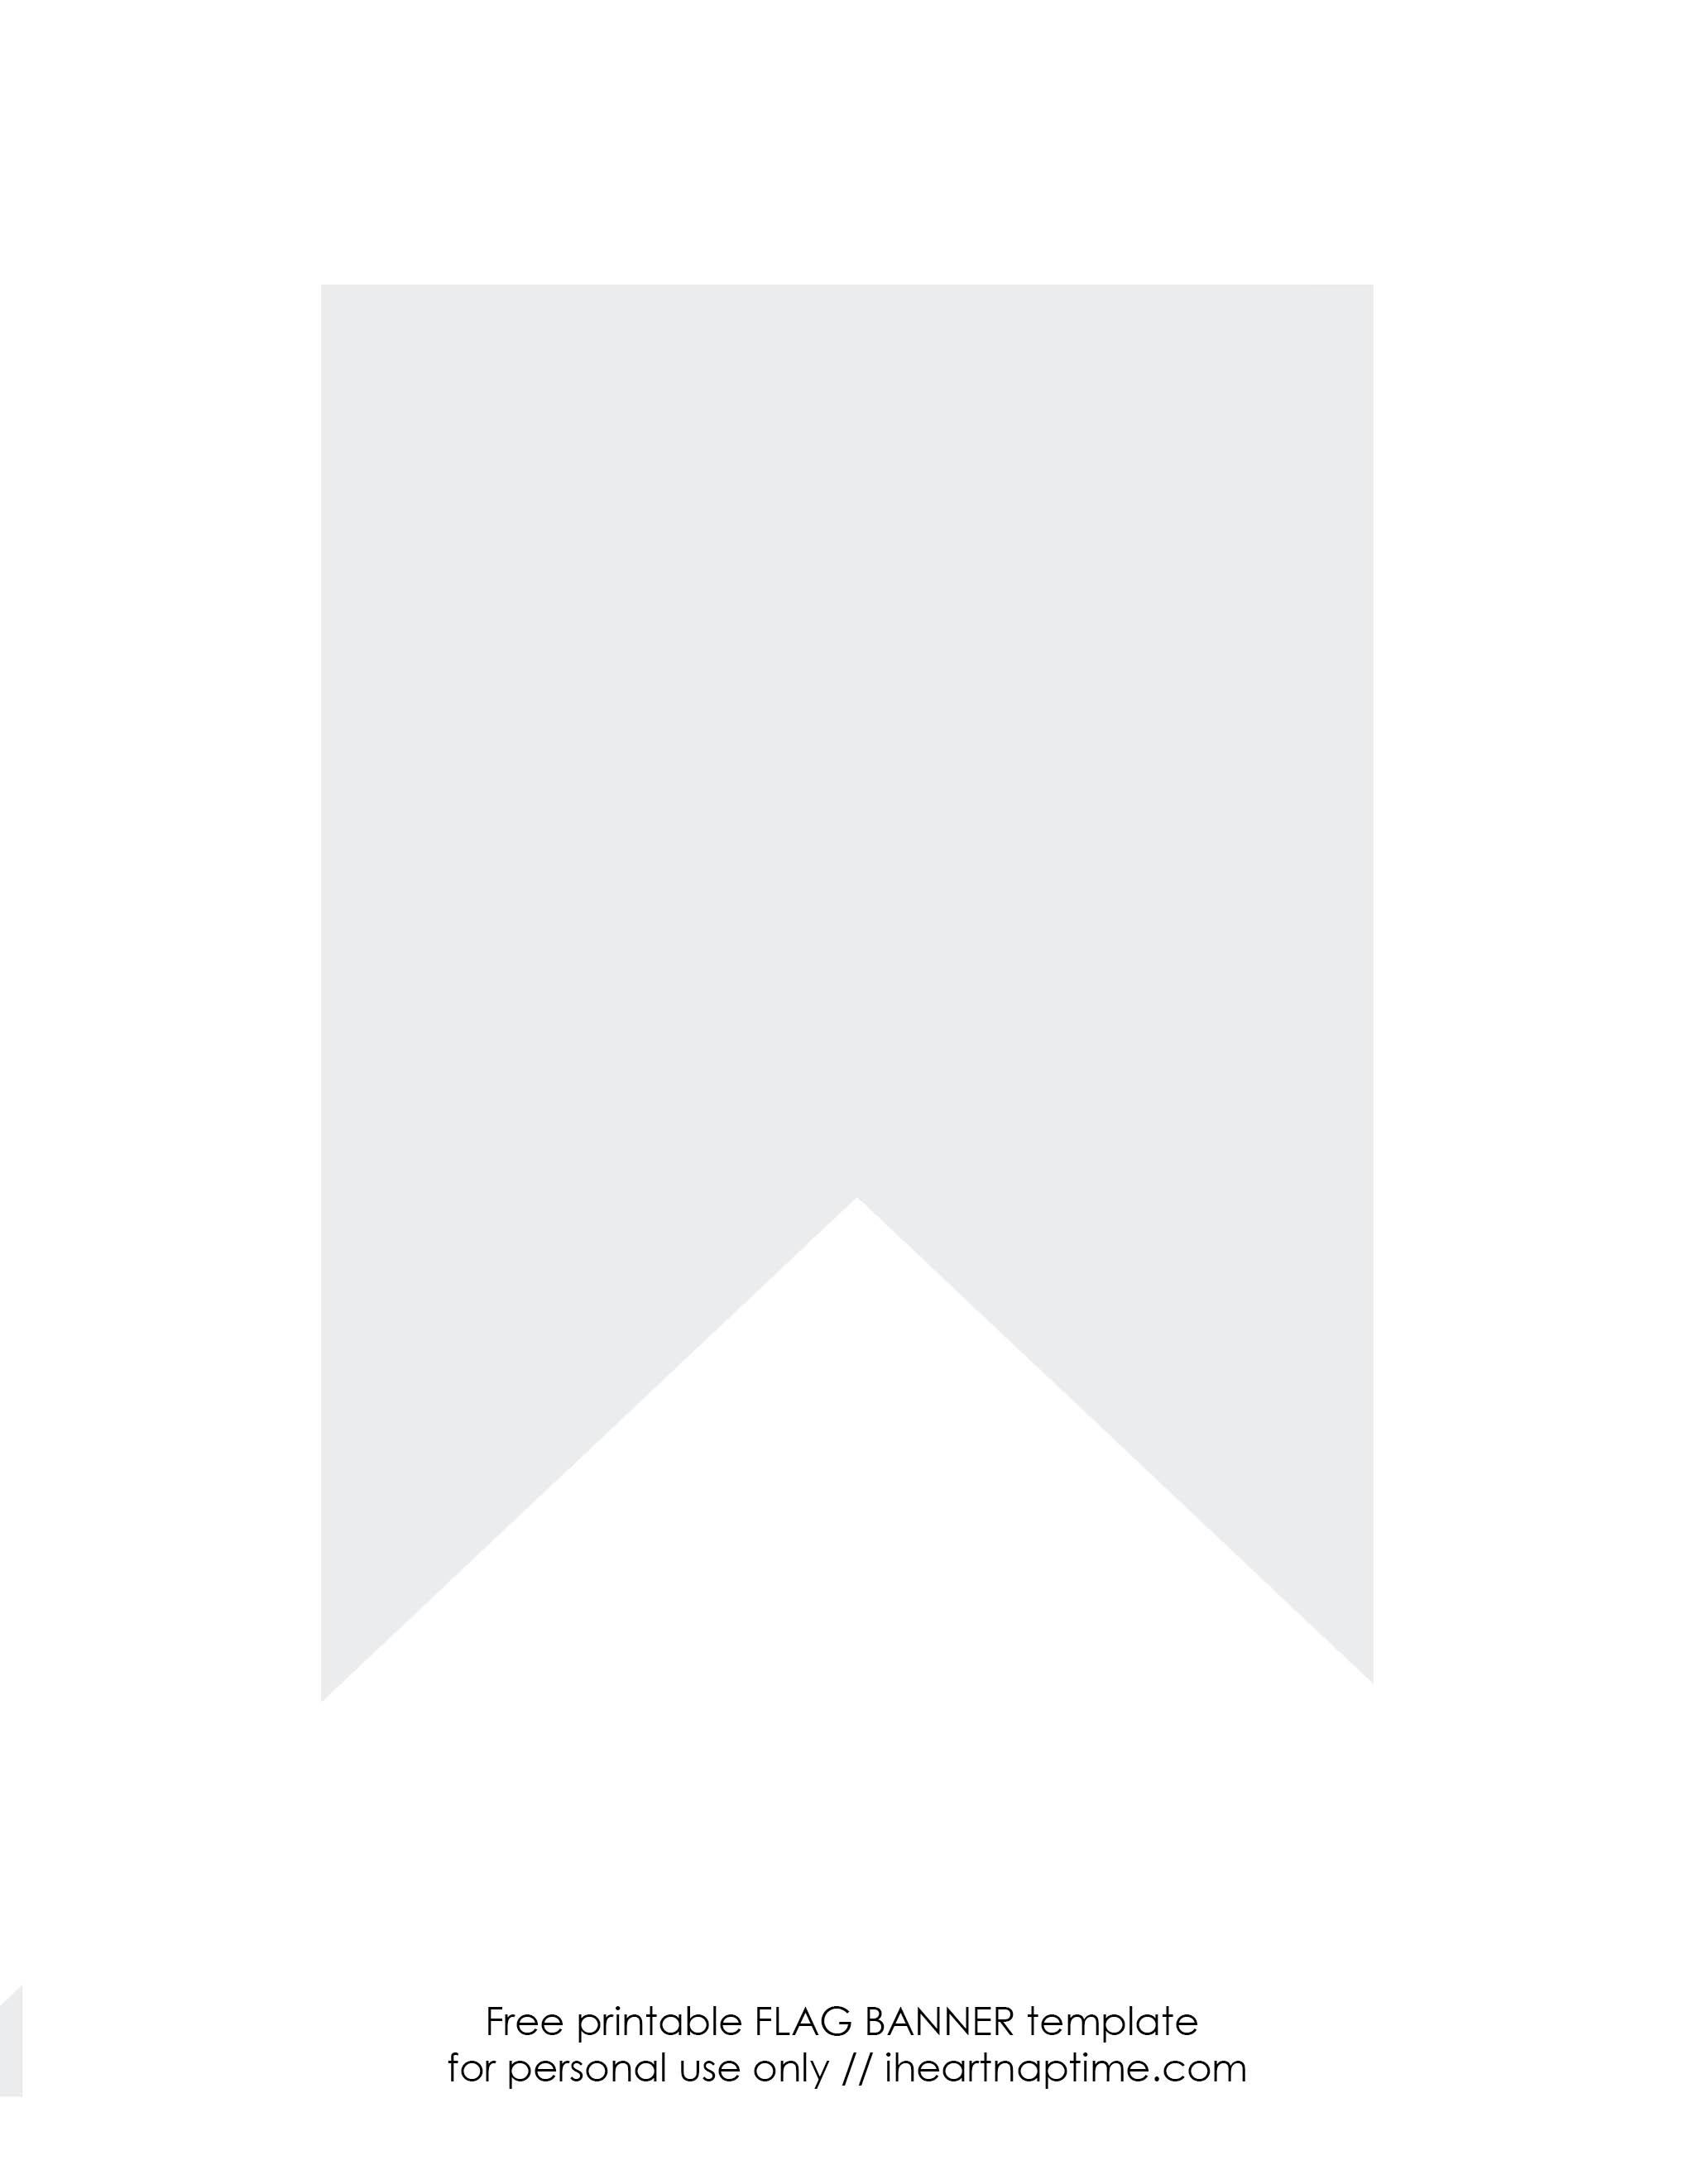 8 best images of printable flag templates blank flag template printable printable flag banner. Black Bedroom Furniture Sets. Home Design Ideas